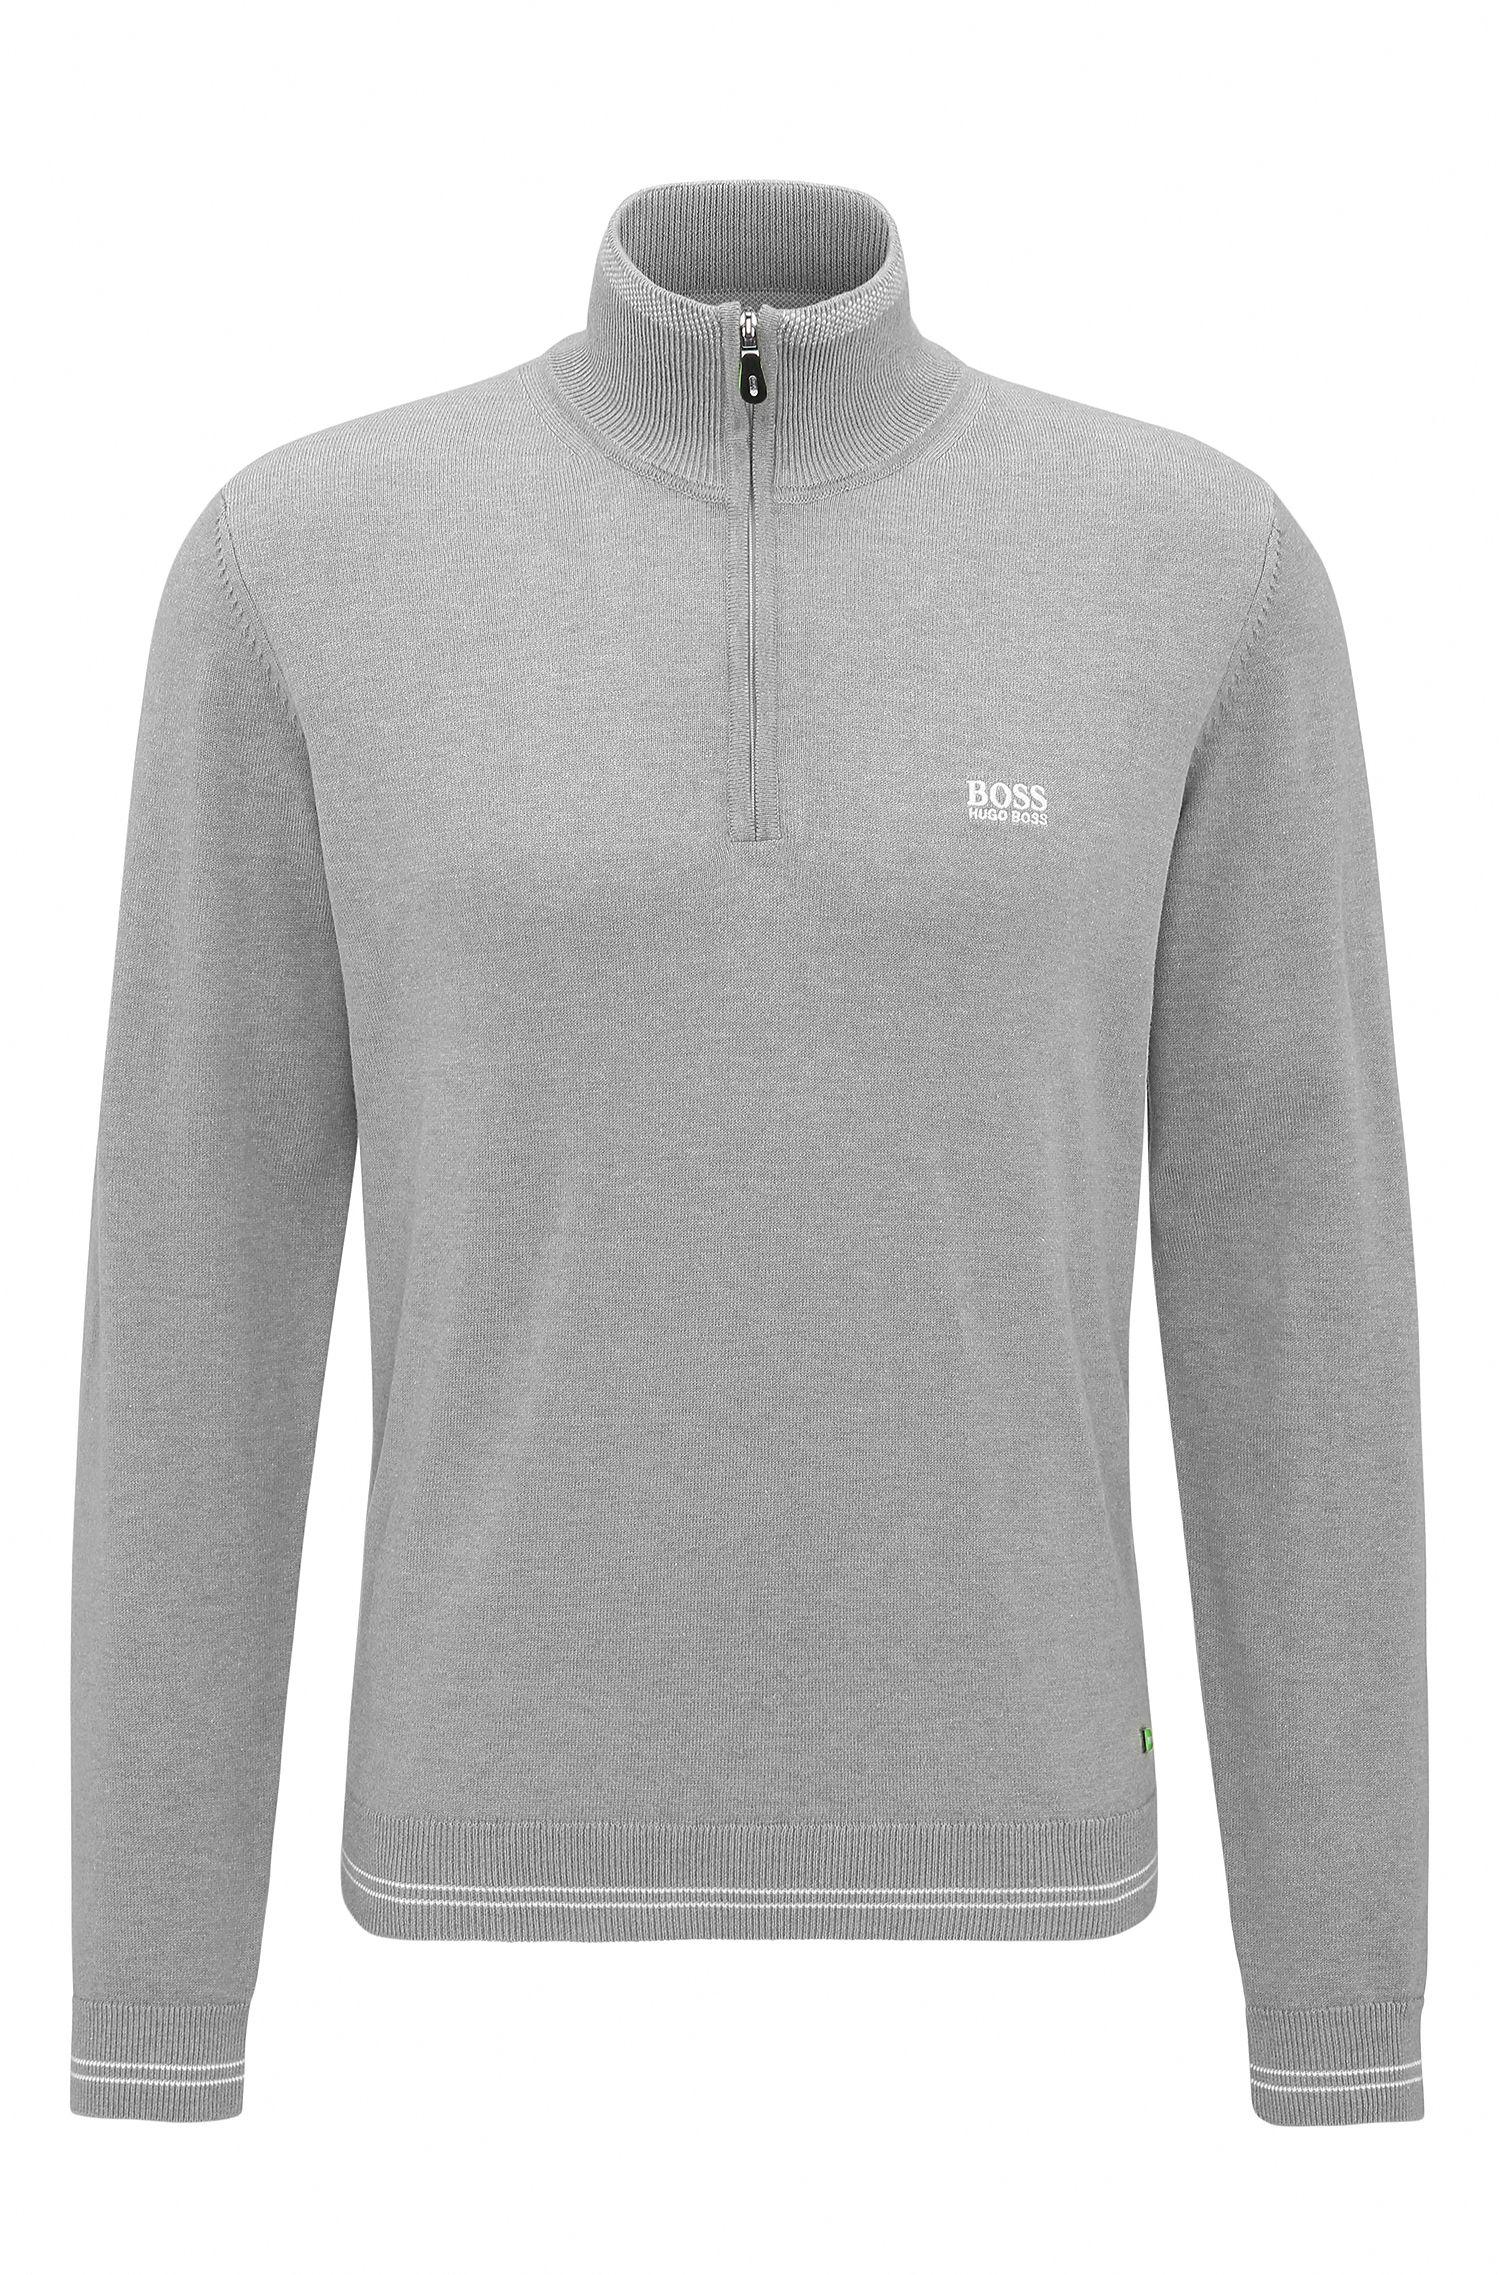 'Zime W17' | Cotton Blend Half-Zip Sweater